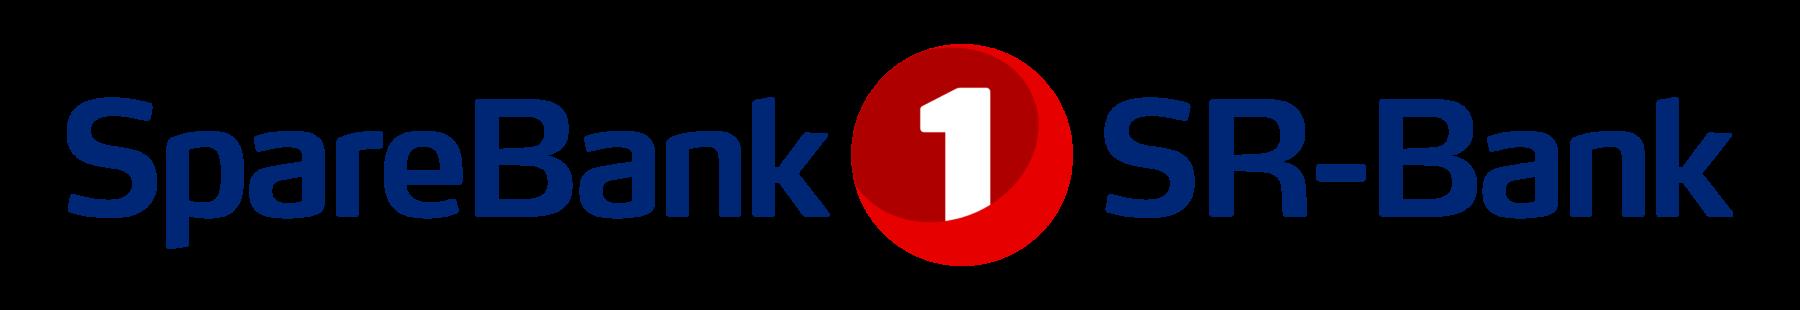 Sparebank1 SR-Bank